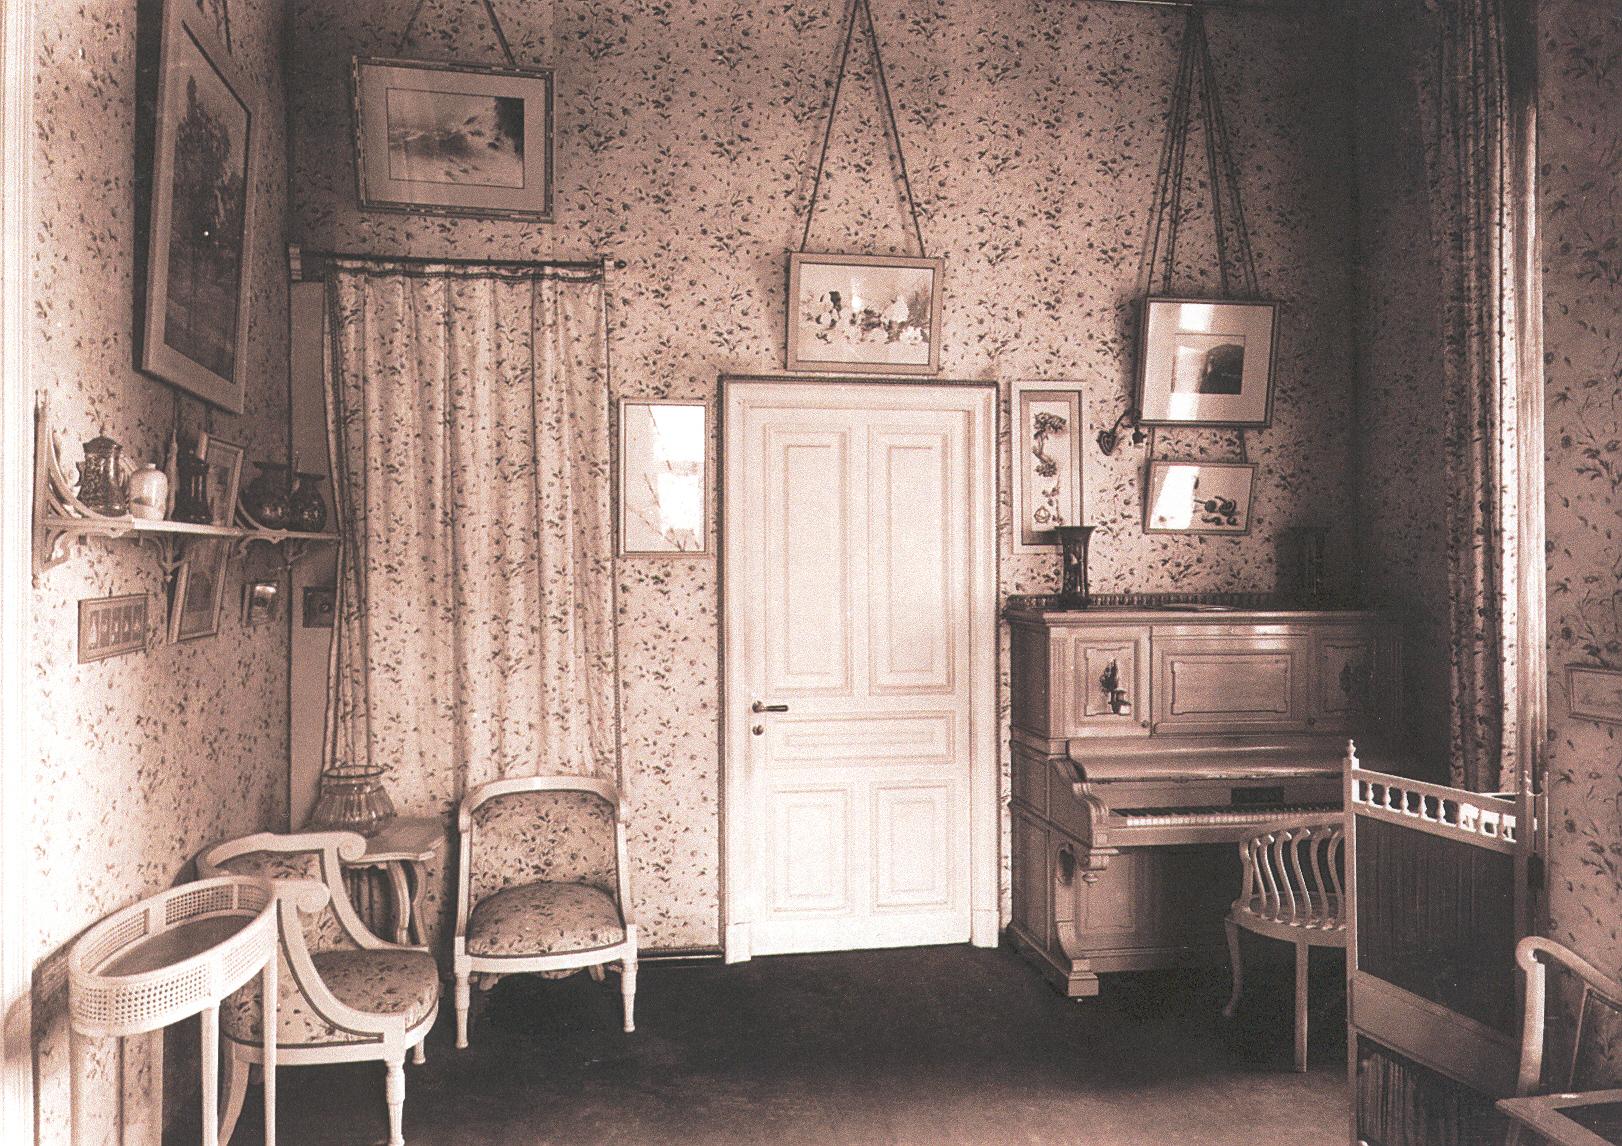 Нижняя дача. Гостиная Алексея